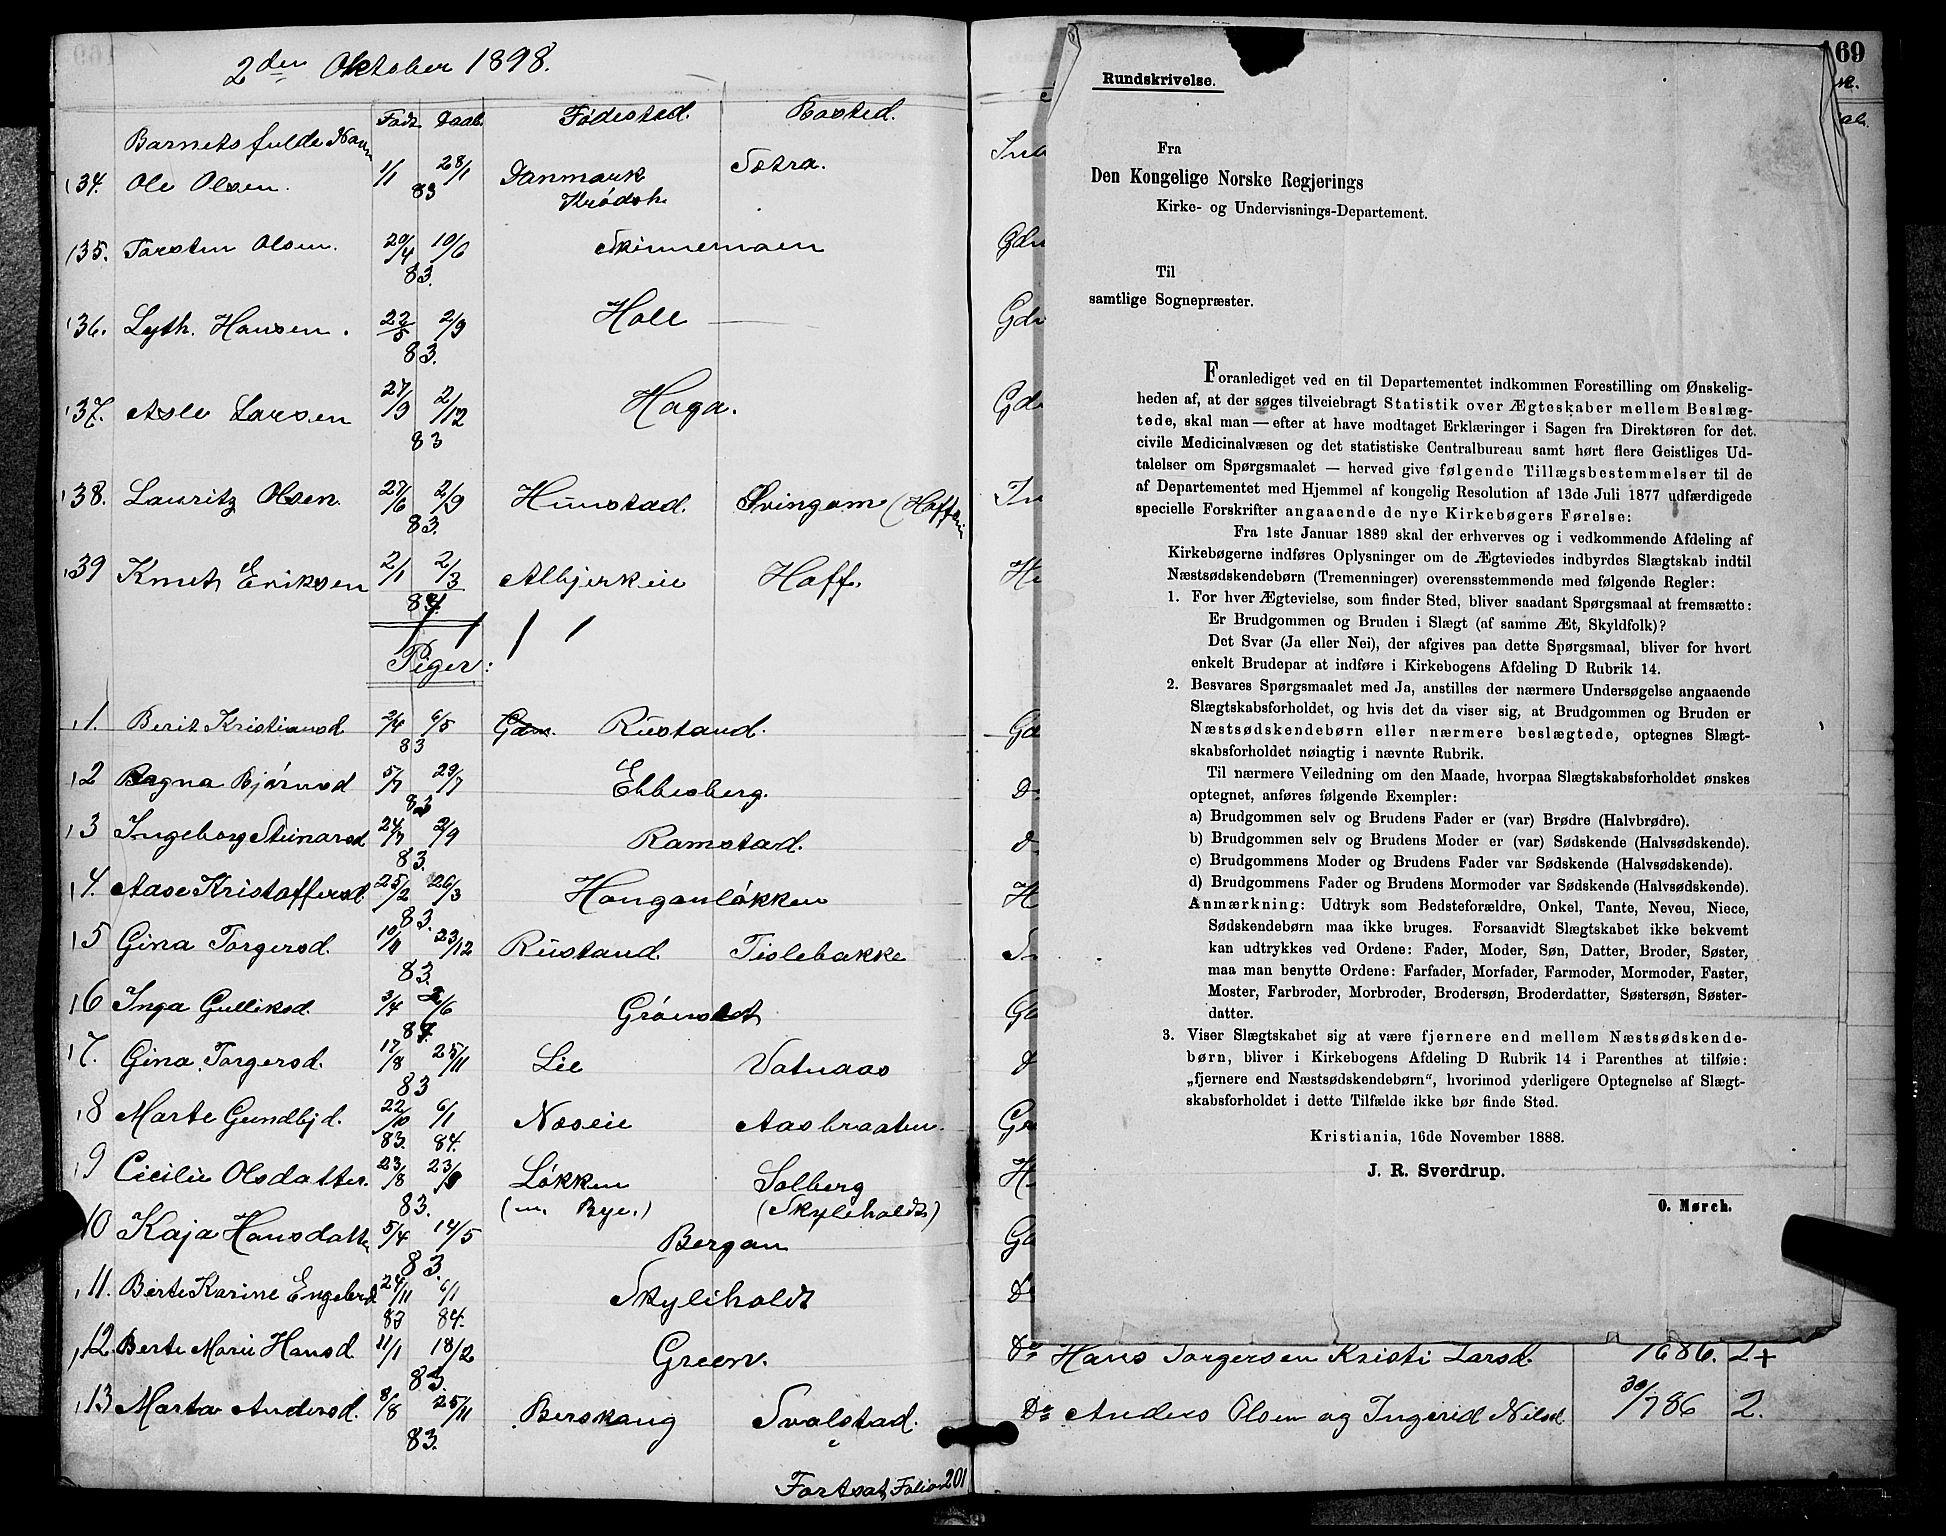 SAKO, Sigdal kirkebøker, G/Ga/L0005: Klokkerbok nr. I 5, 1886-1900, s. 169